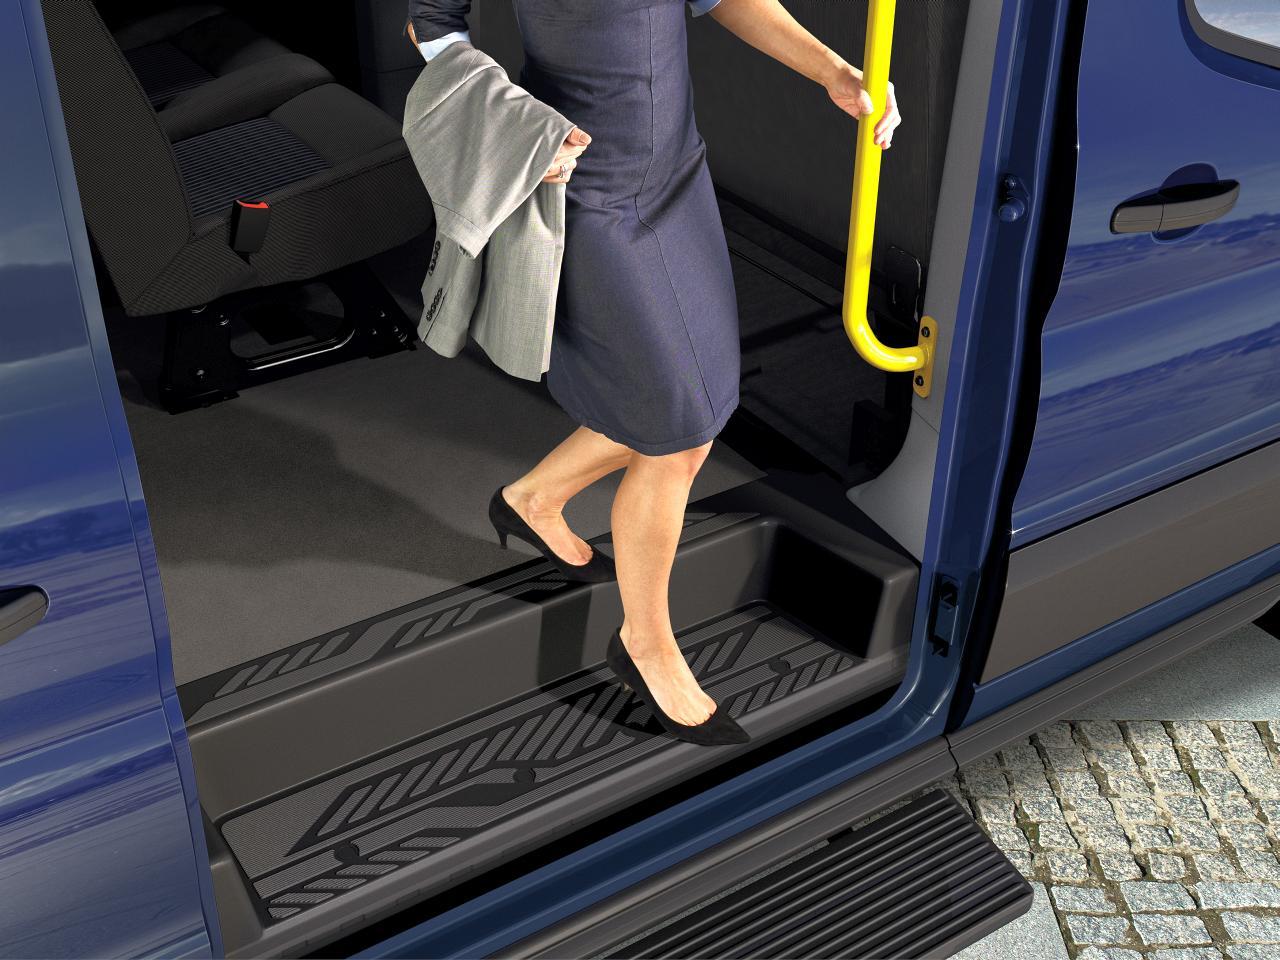 Ford-Transit_31-Hagemeier